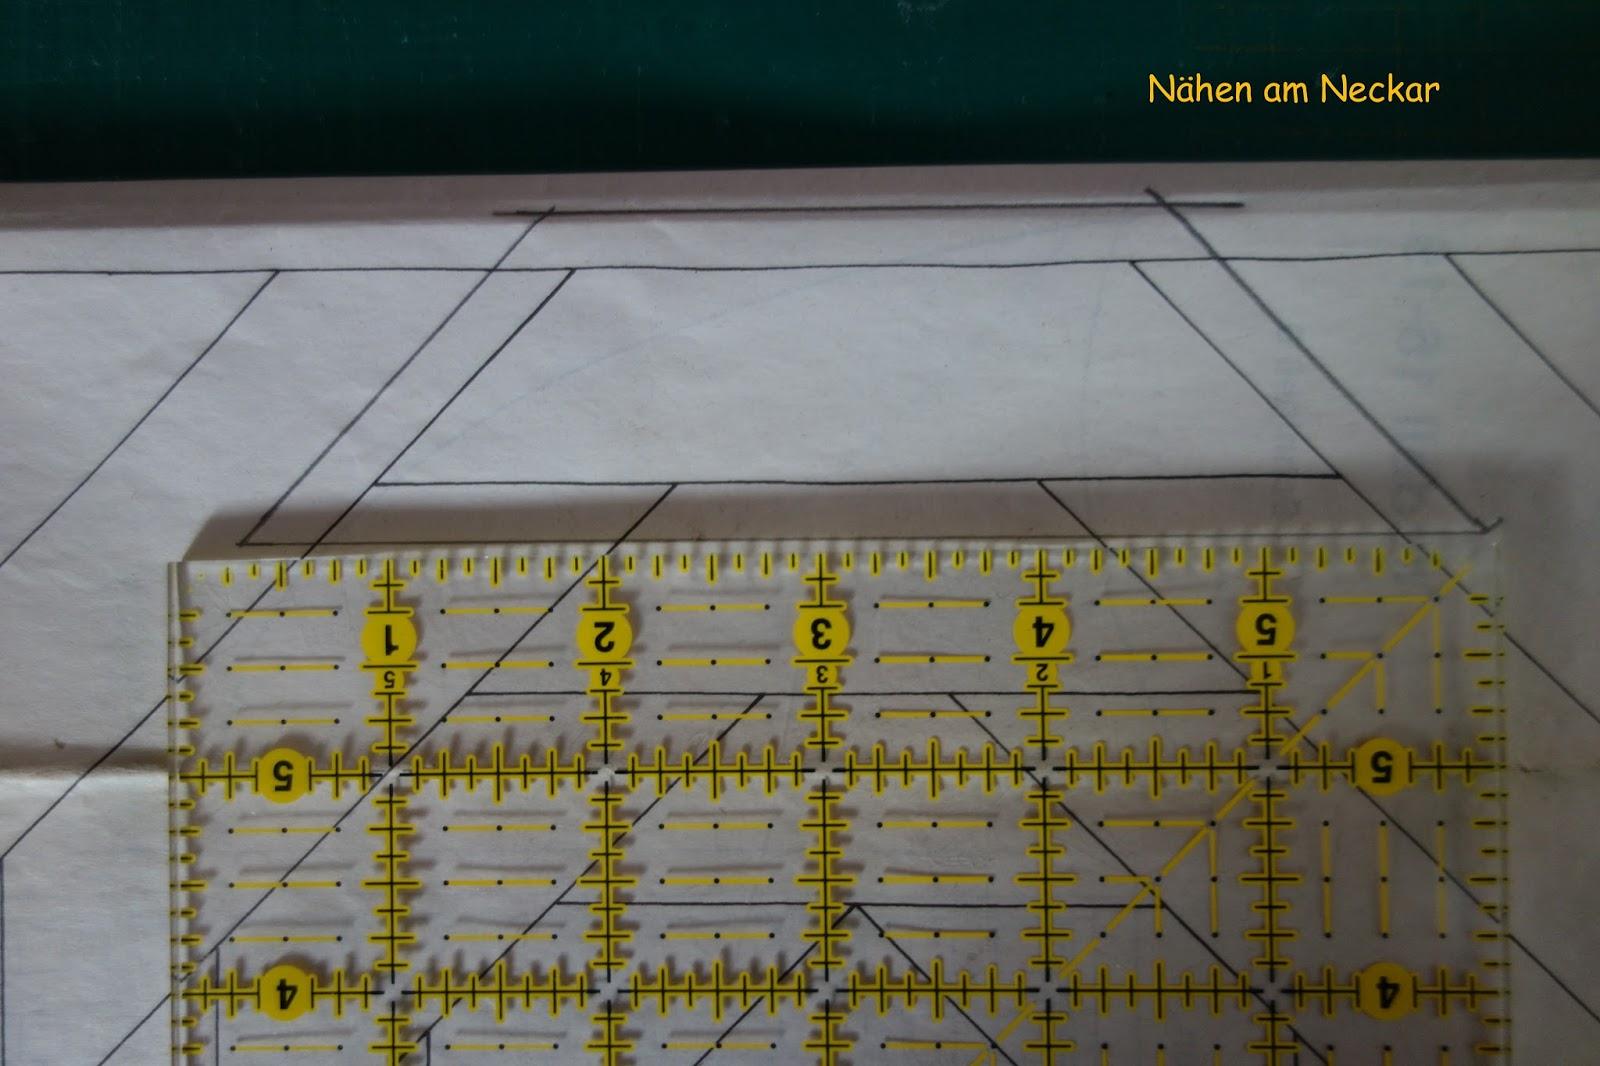 NÄHEN AM NECKAR: Pineapple-Muster die ersten Blöcke